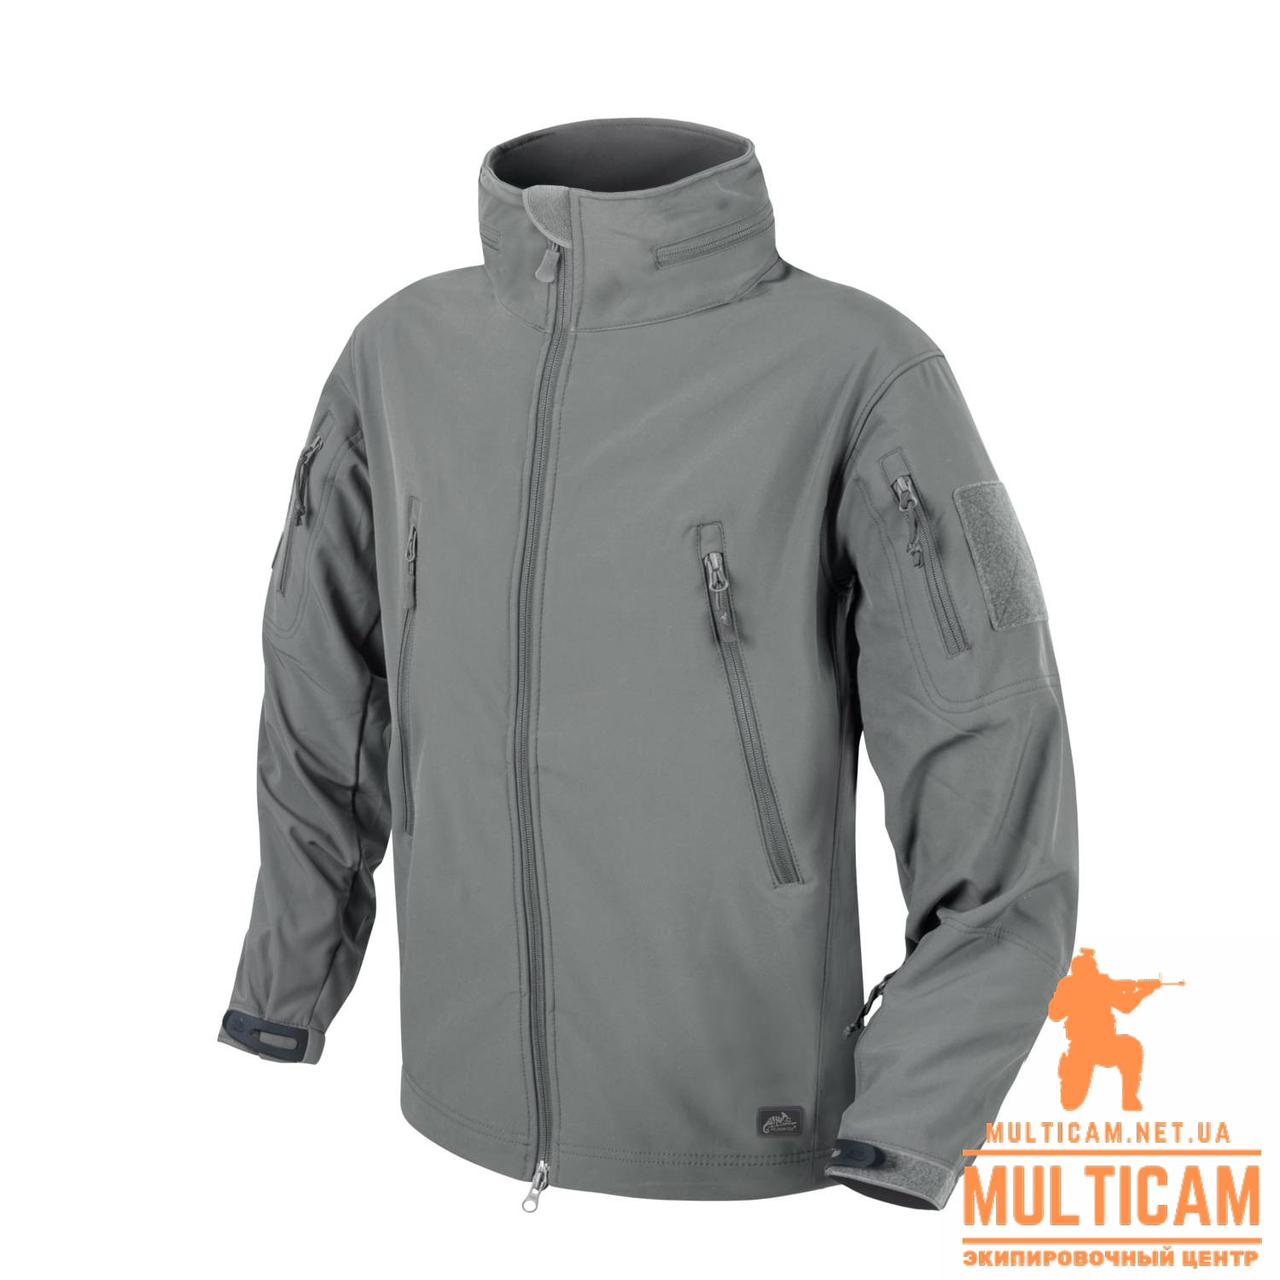 Куртка Helikon-Tex® GUNFIGHTER Jacket - Shark Skin Windblocker - Foliage Green